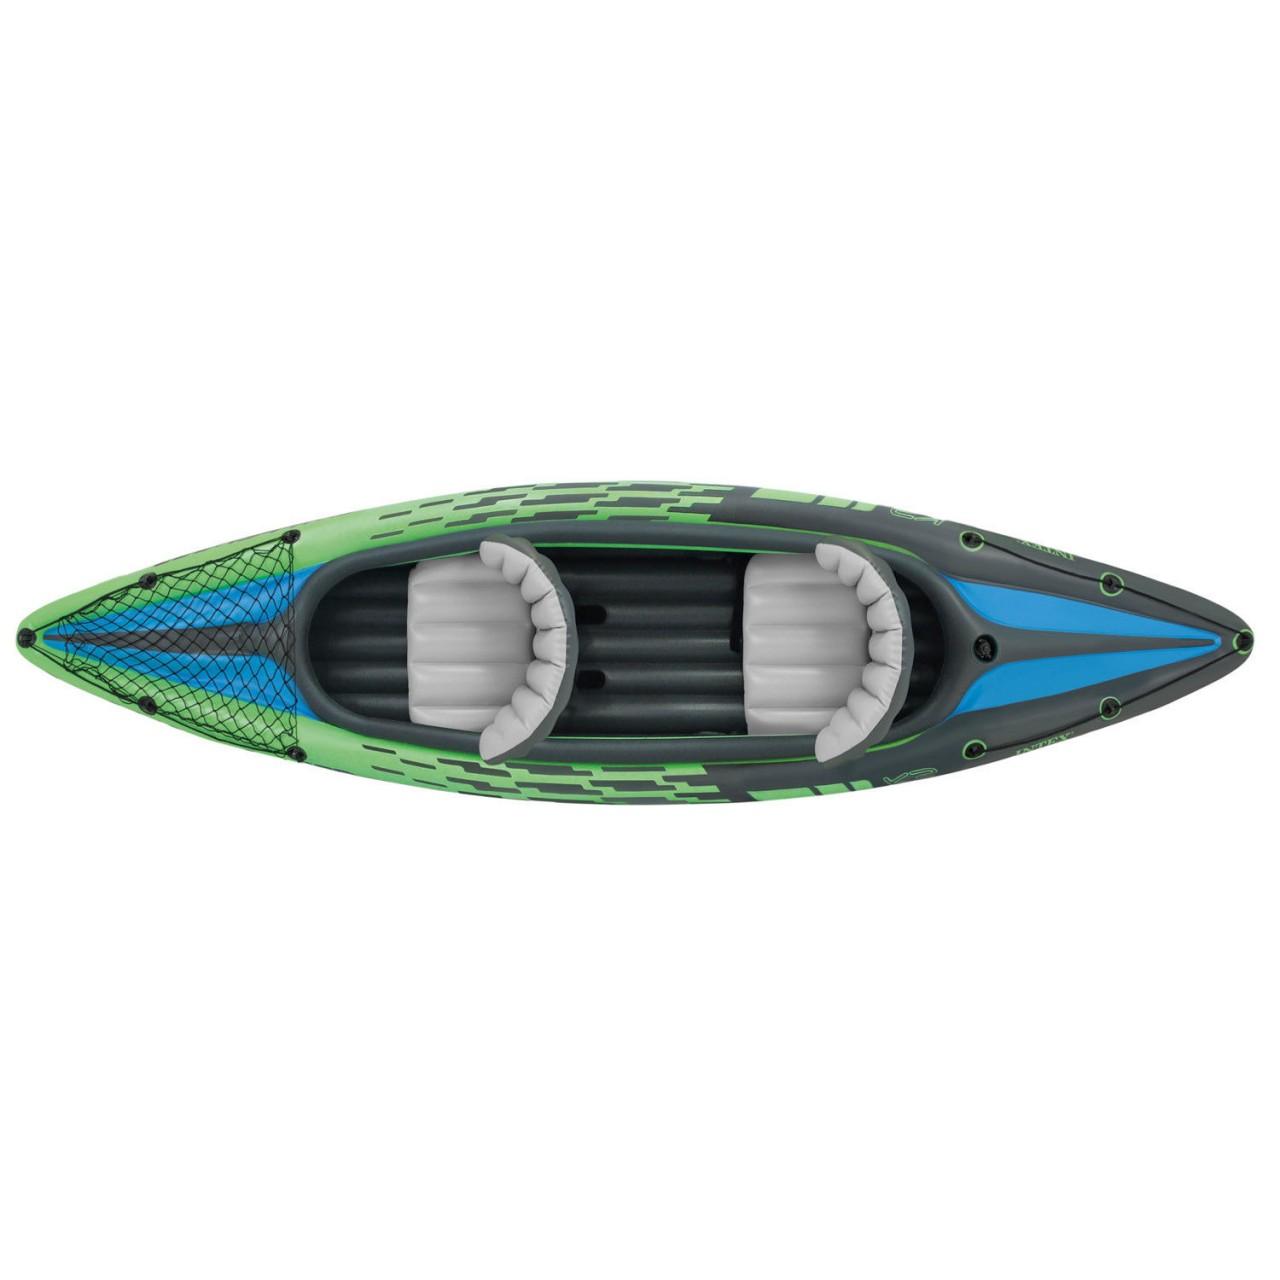 Intex 68306 Kajak Challenger K2 Set Schlauchboot Paddelboot + Alu Paddel Pumpe